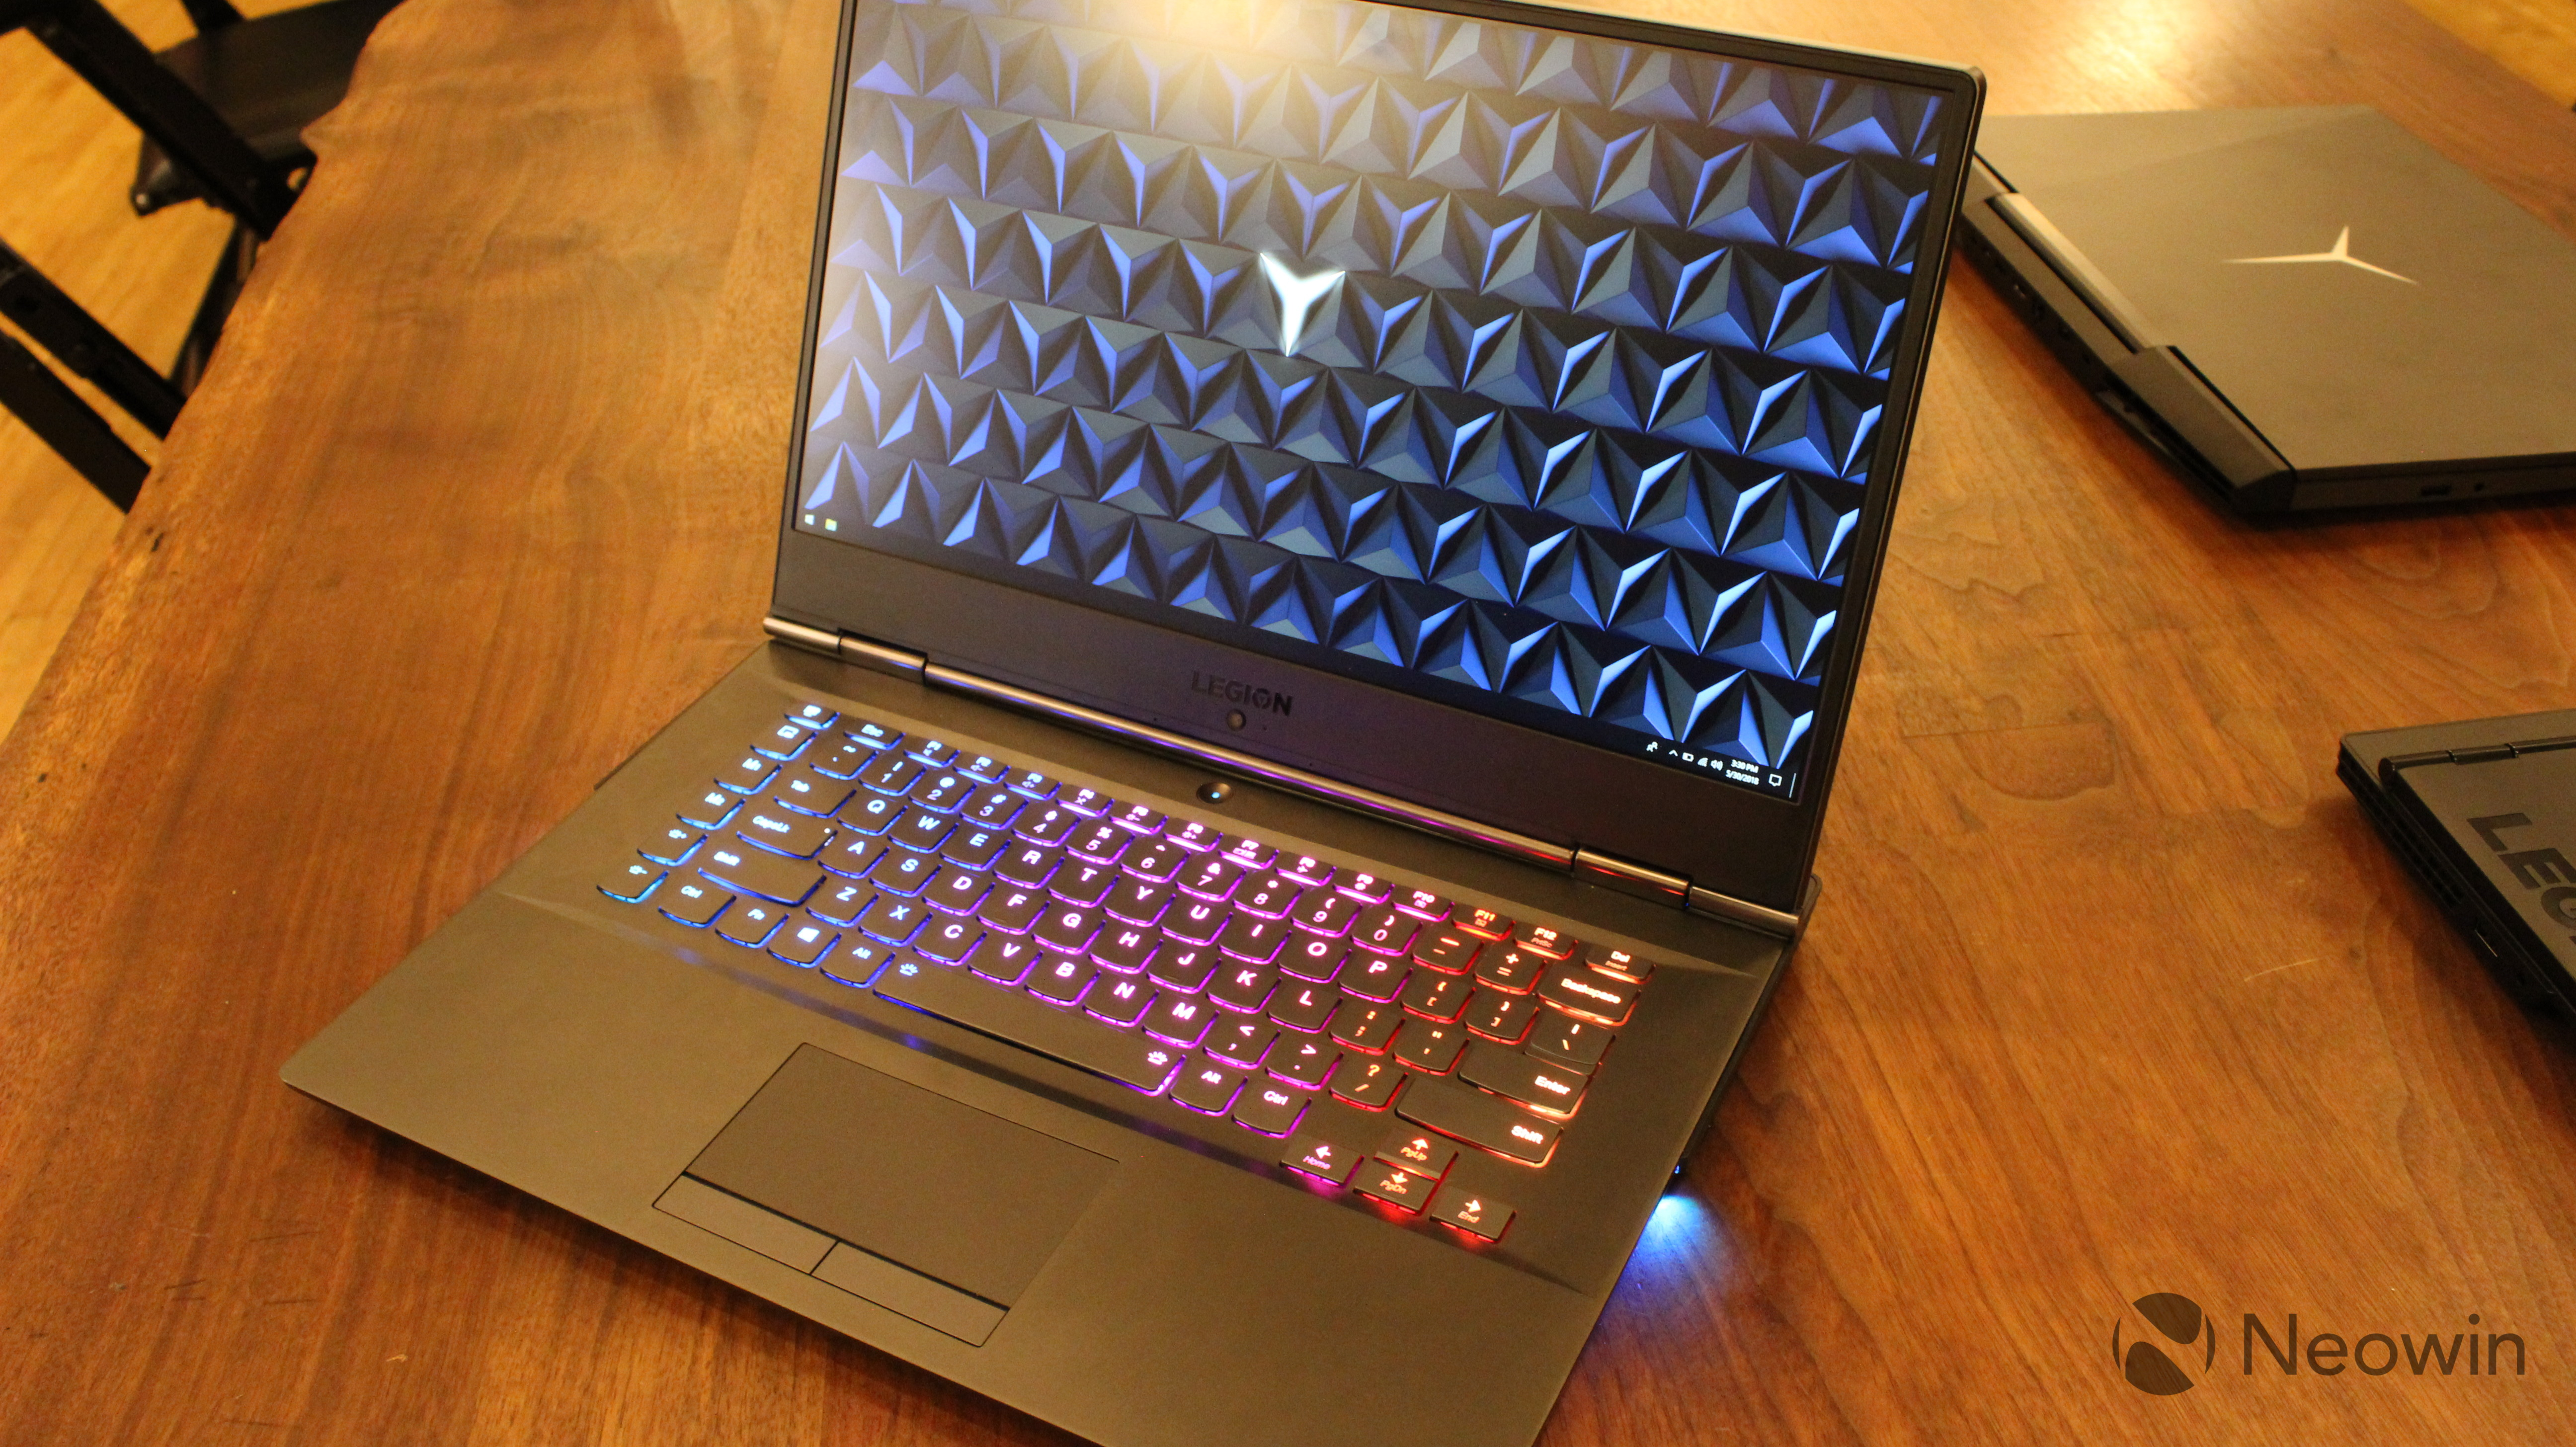 Lenovo refreshes its Legion gaming PCs with new designs, Nvidia GTX